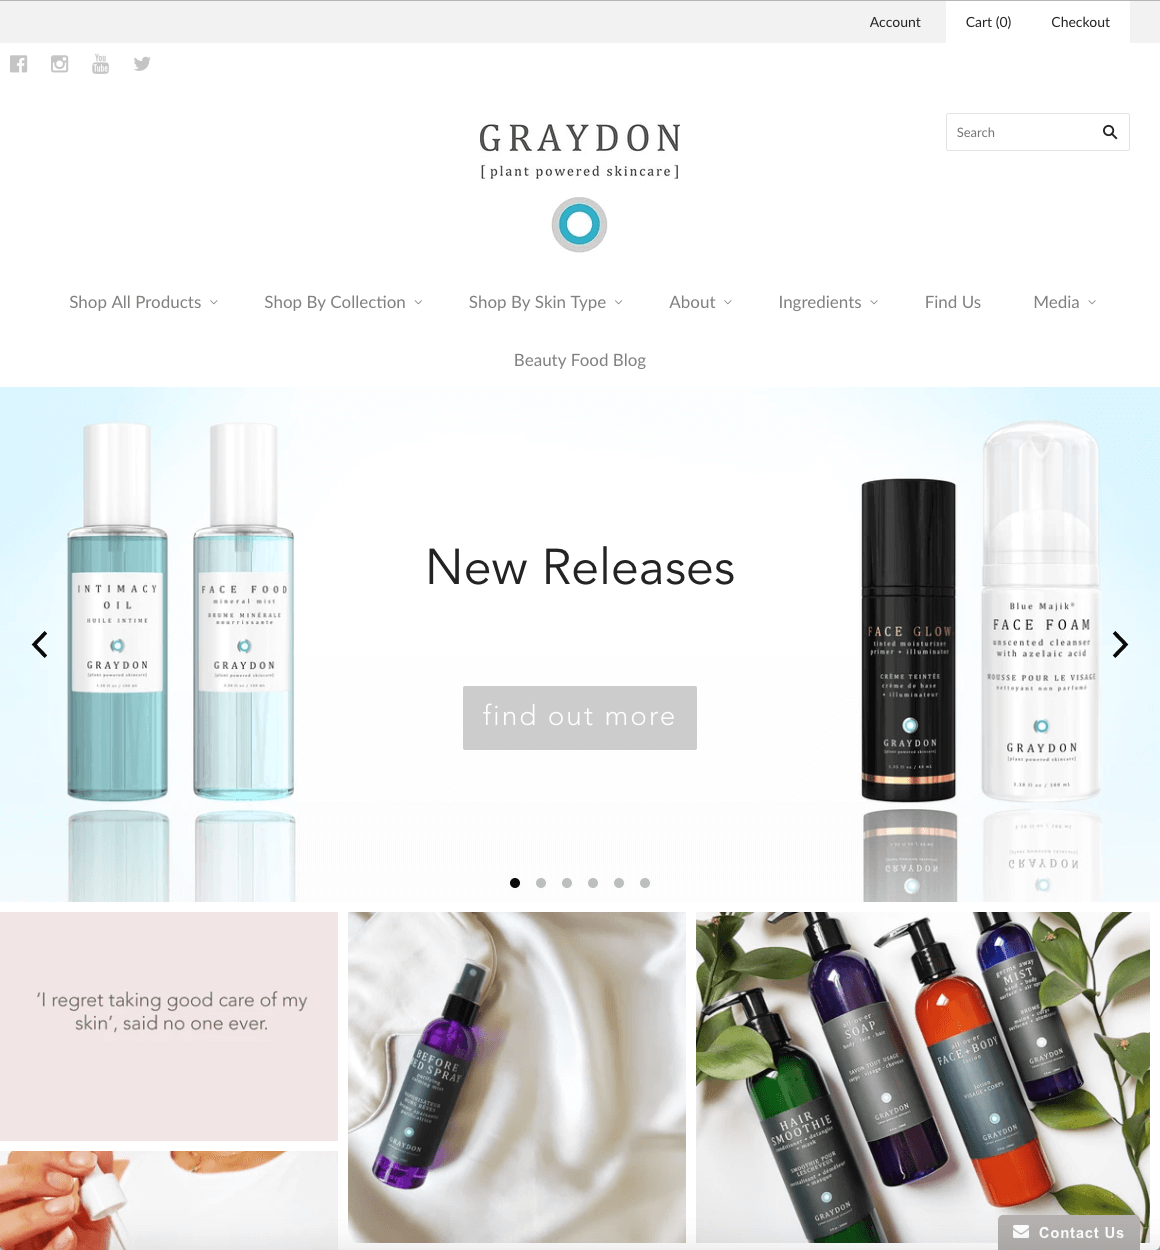 GraydonSkincare.com